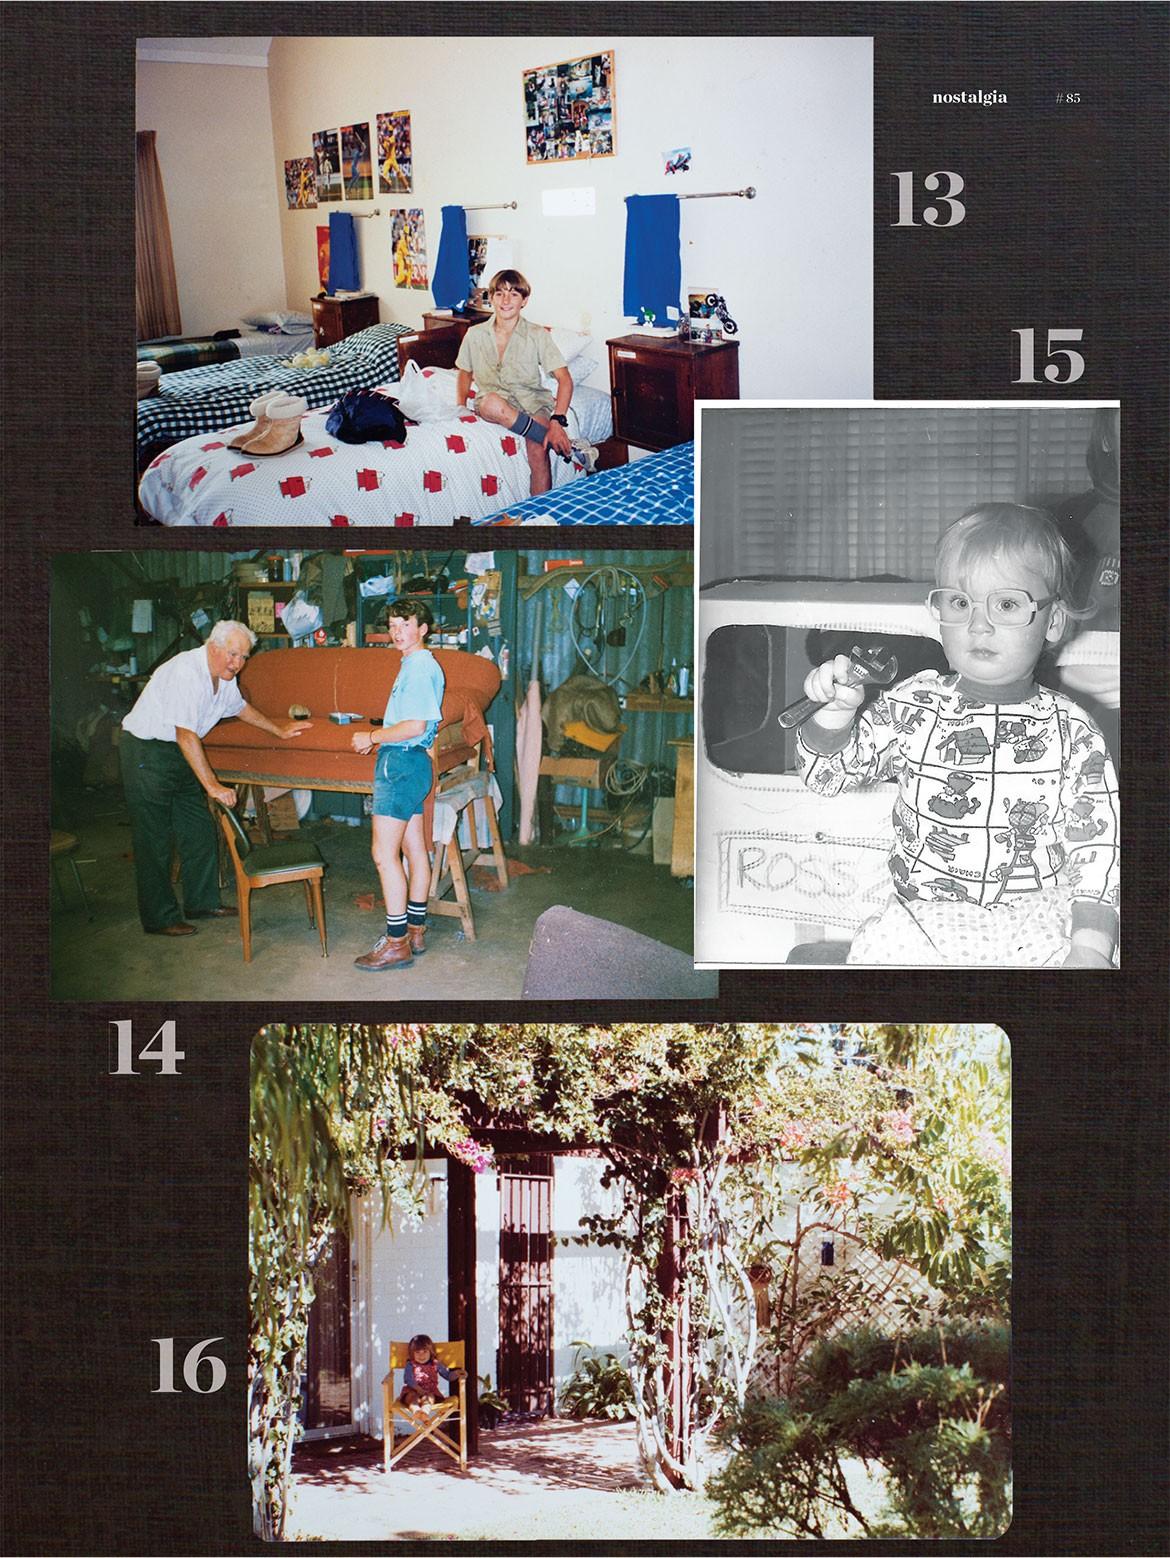 4_Habitus_Family_Album_Henry_Wilson_Jon_Goulder_Ross_Gardam_Adam_Goodrum.jpg